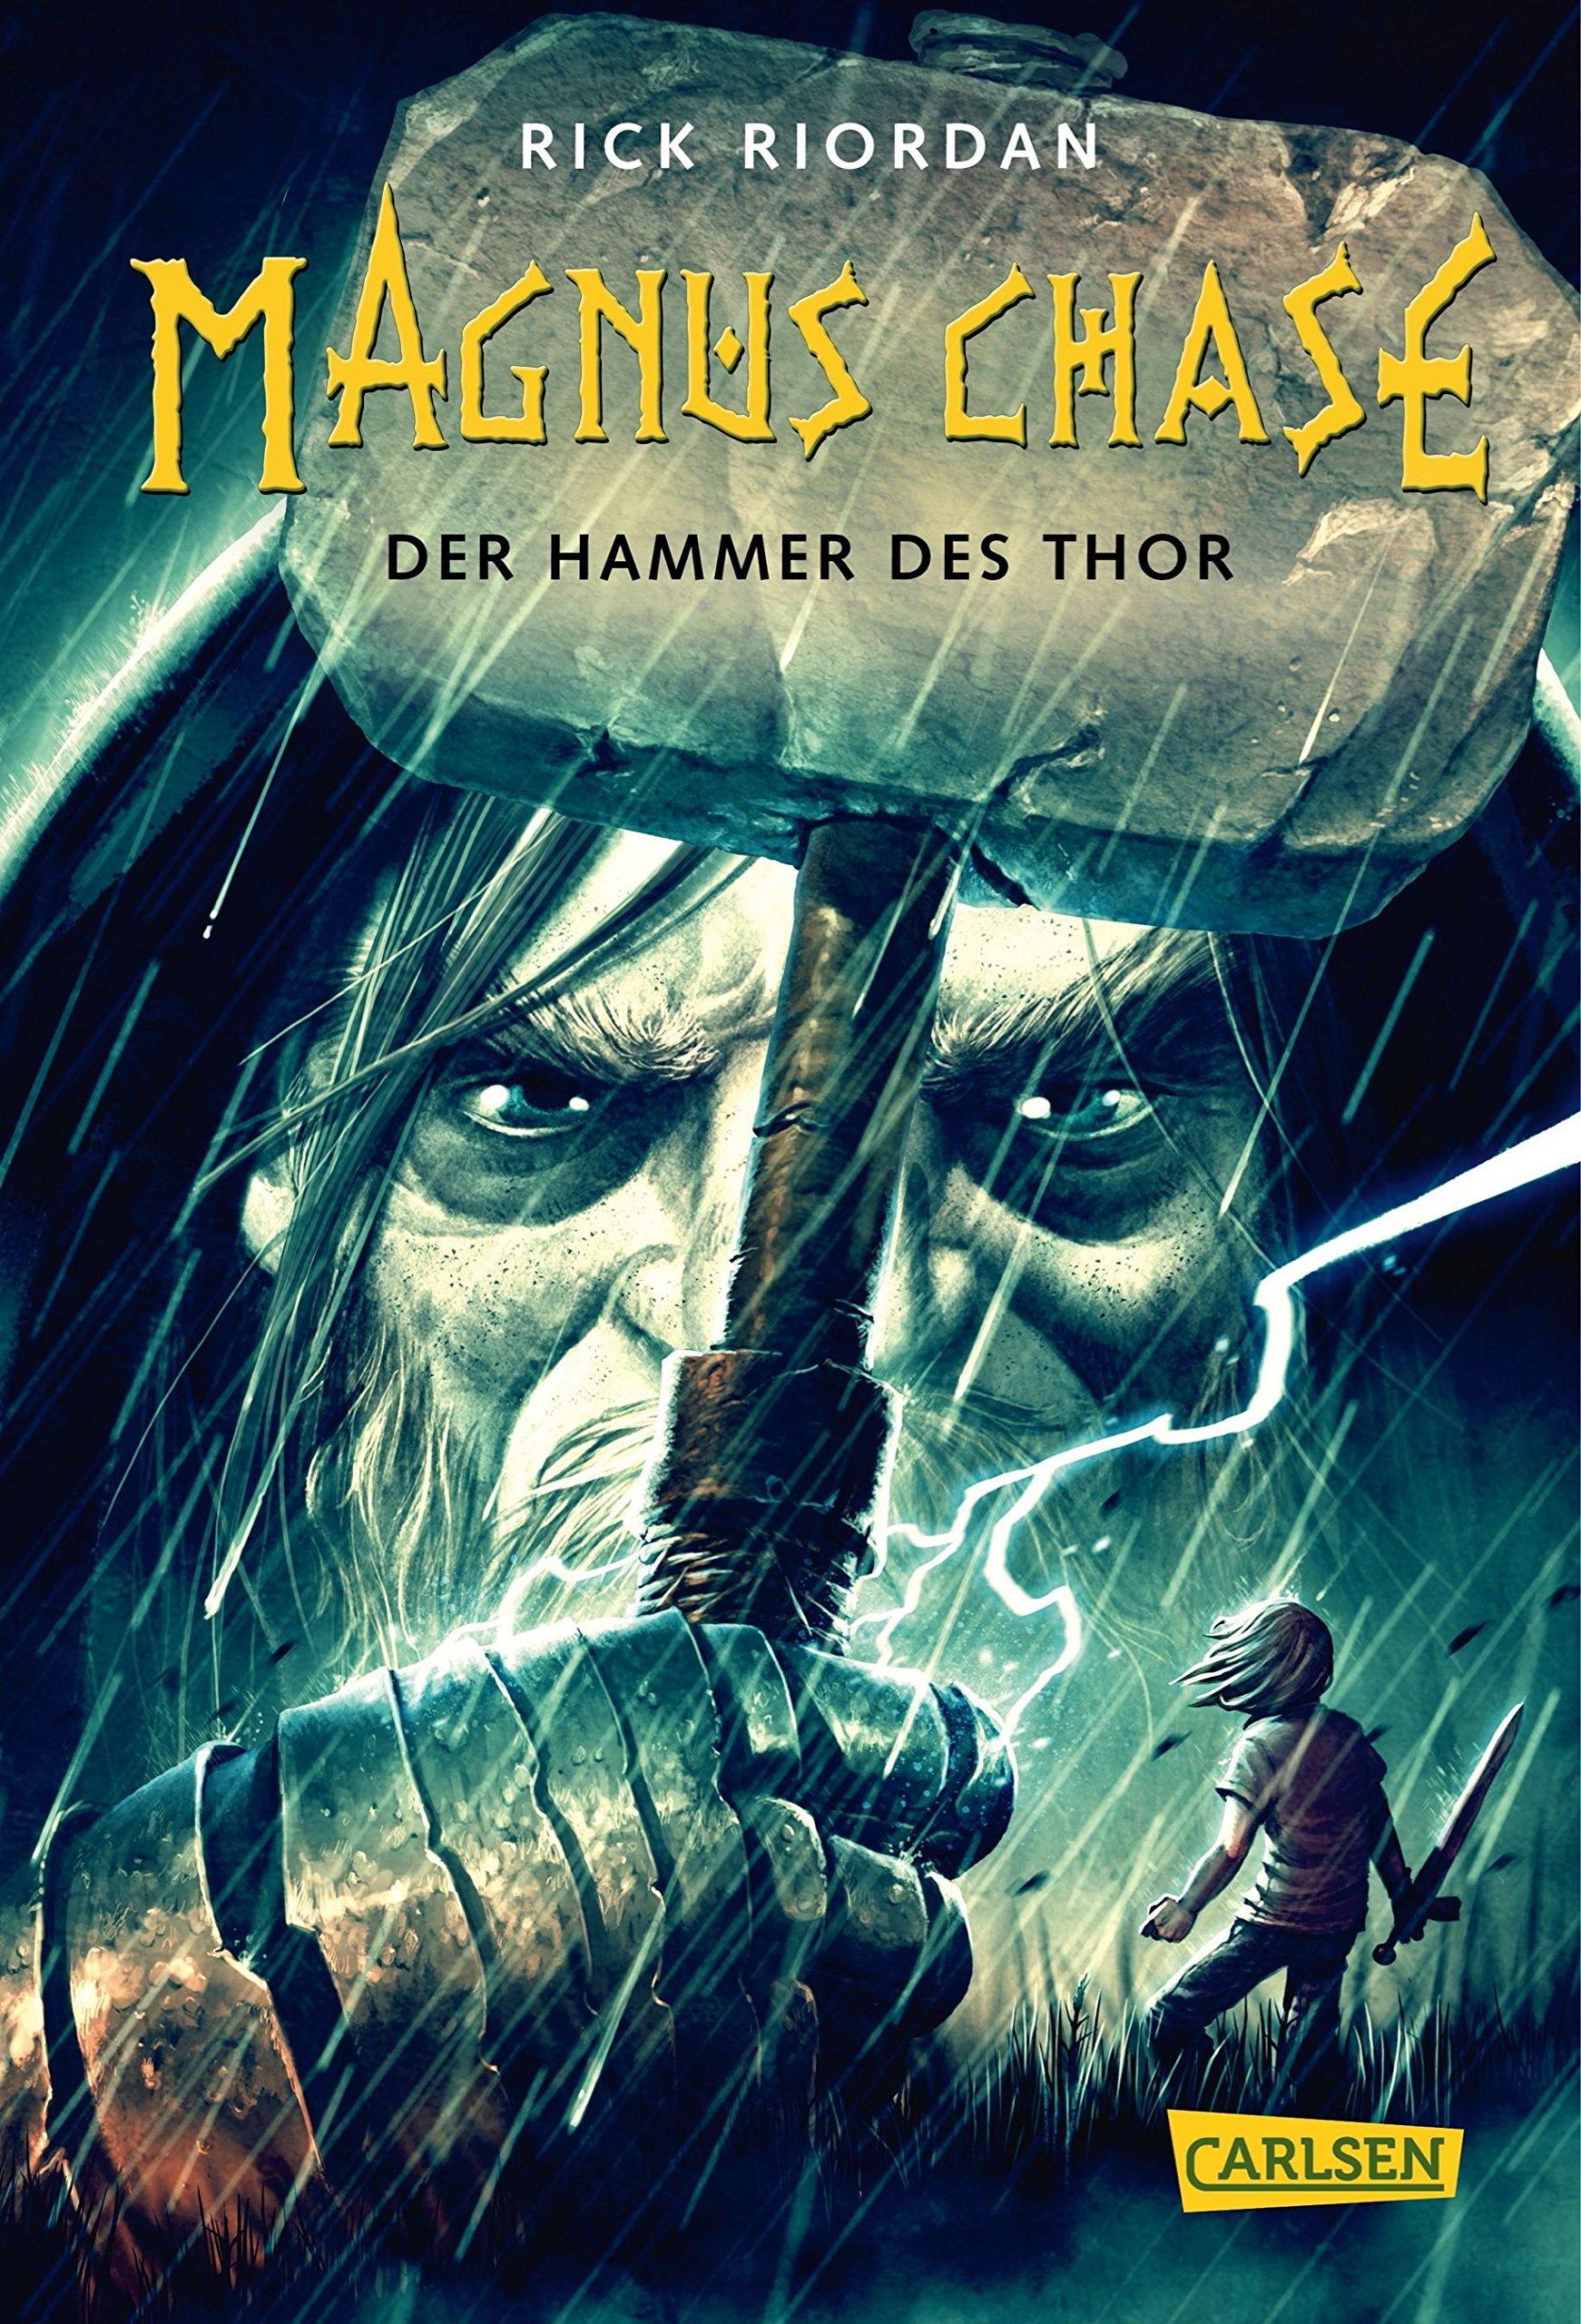 Magnus Chase 2: Der Hammer des Thor Gebundenes Buch – 26. Mai 2017 Rick Riordan Gabriele Haefs Carlsen 3551556695